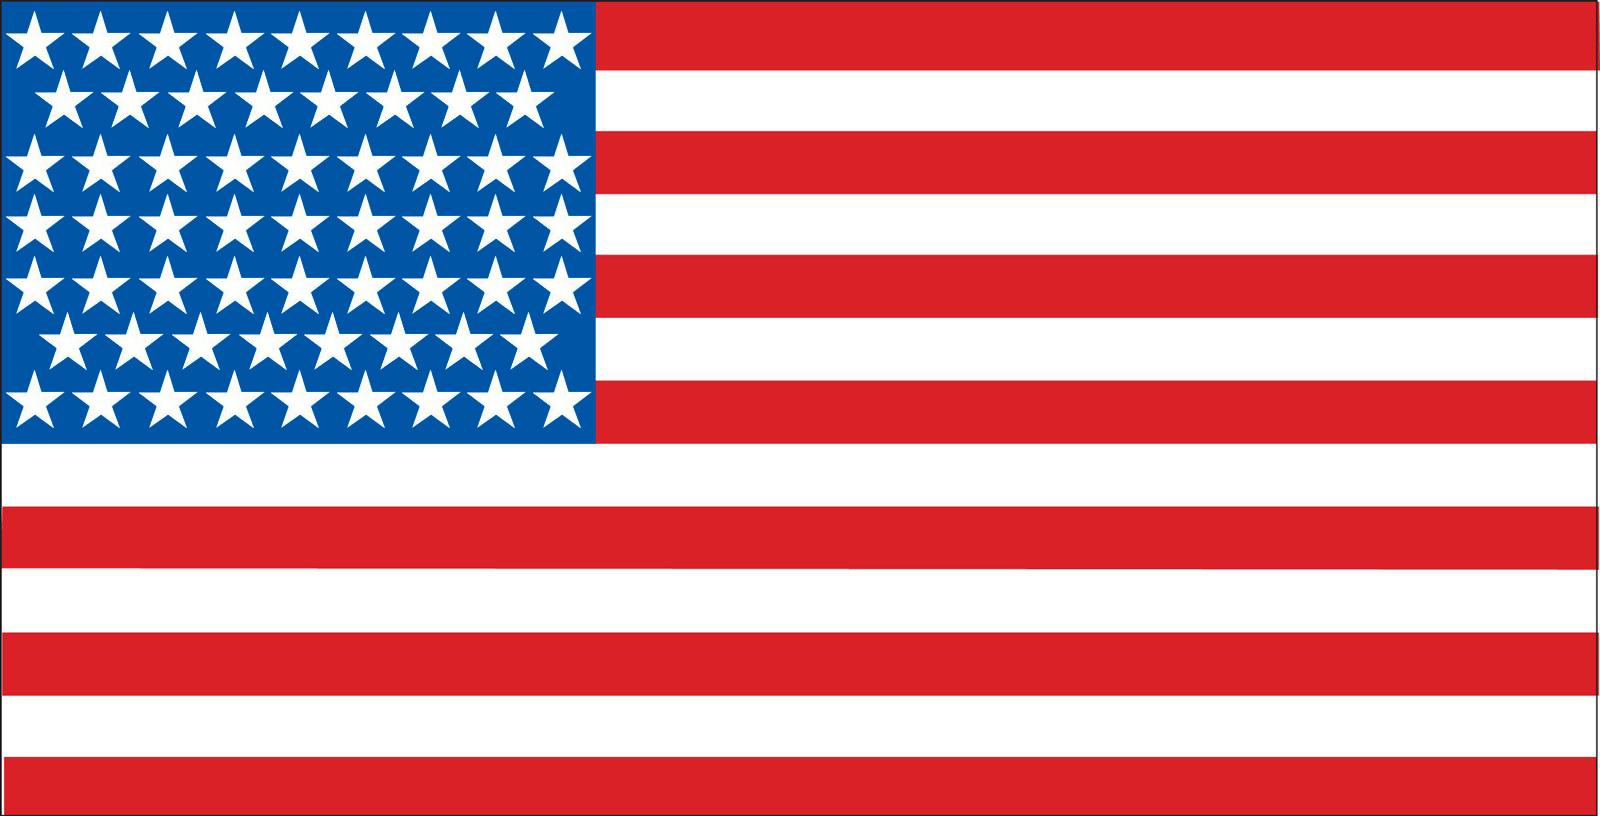 United States American Flag HD Wallpaper 3596 Wallpaper computer 1600x816